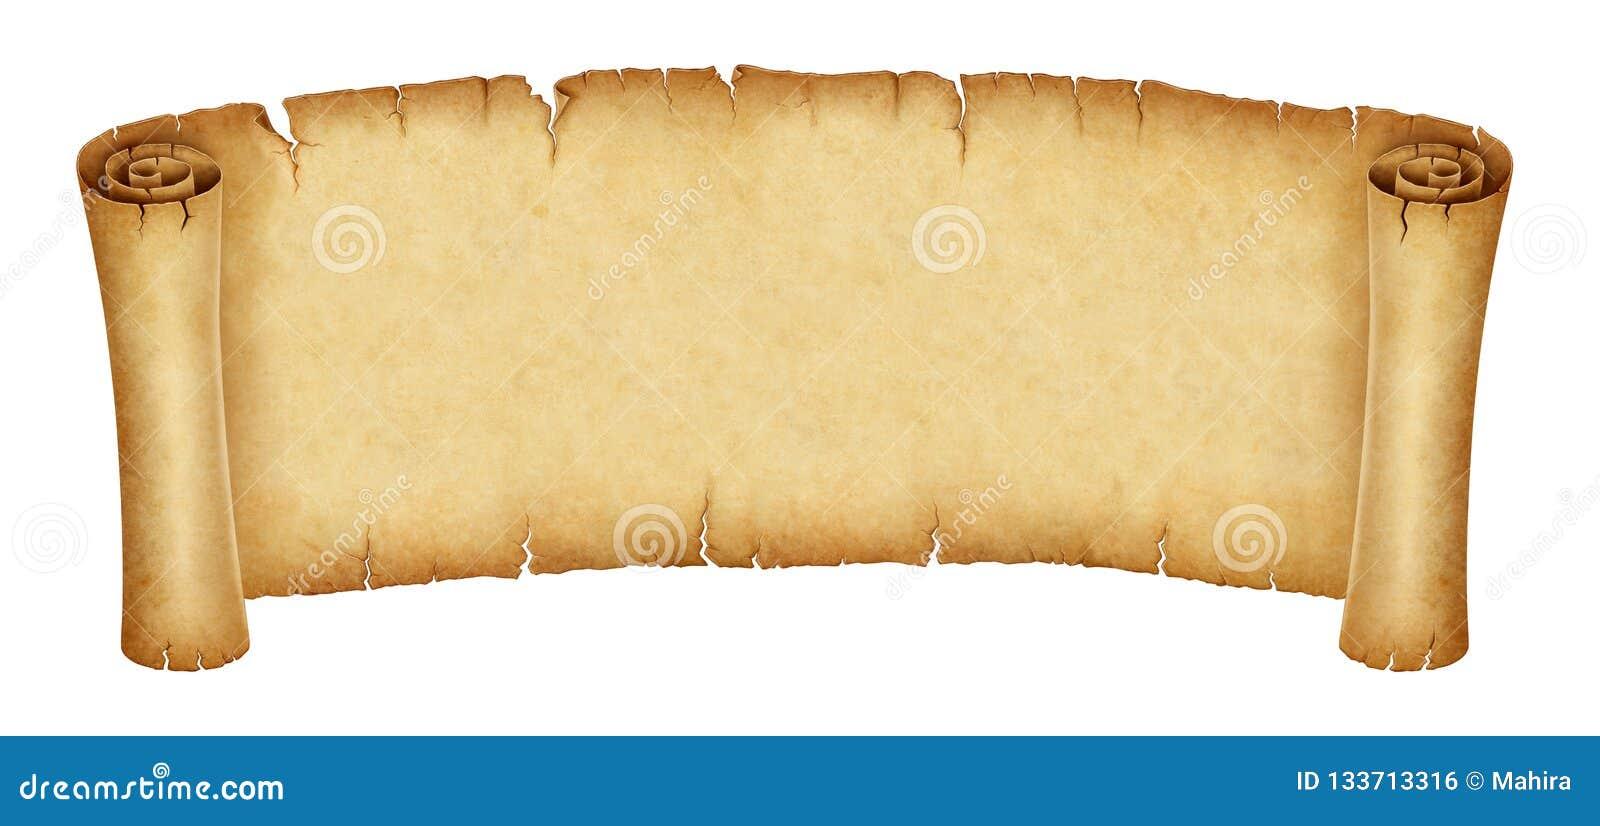 Bandeira velha do rolo isolada no fundo branco